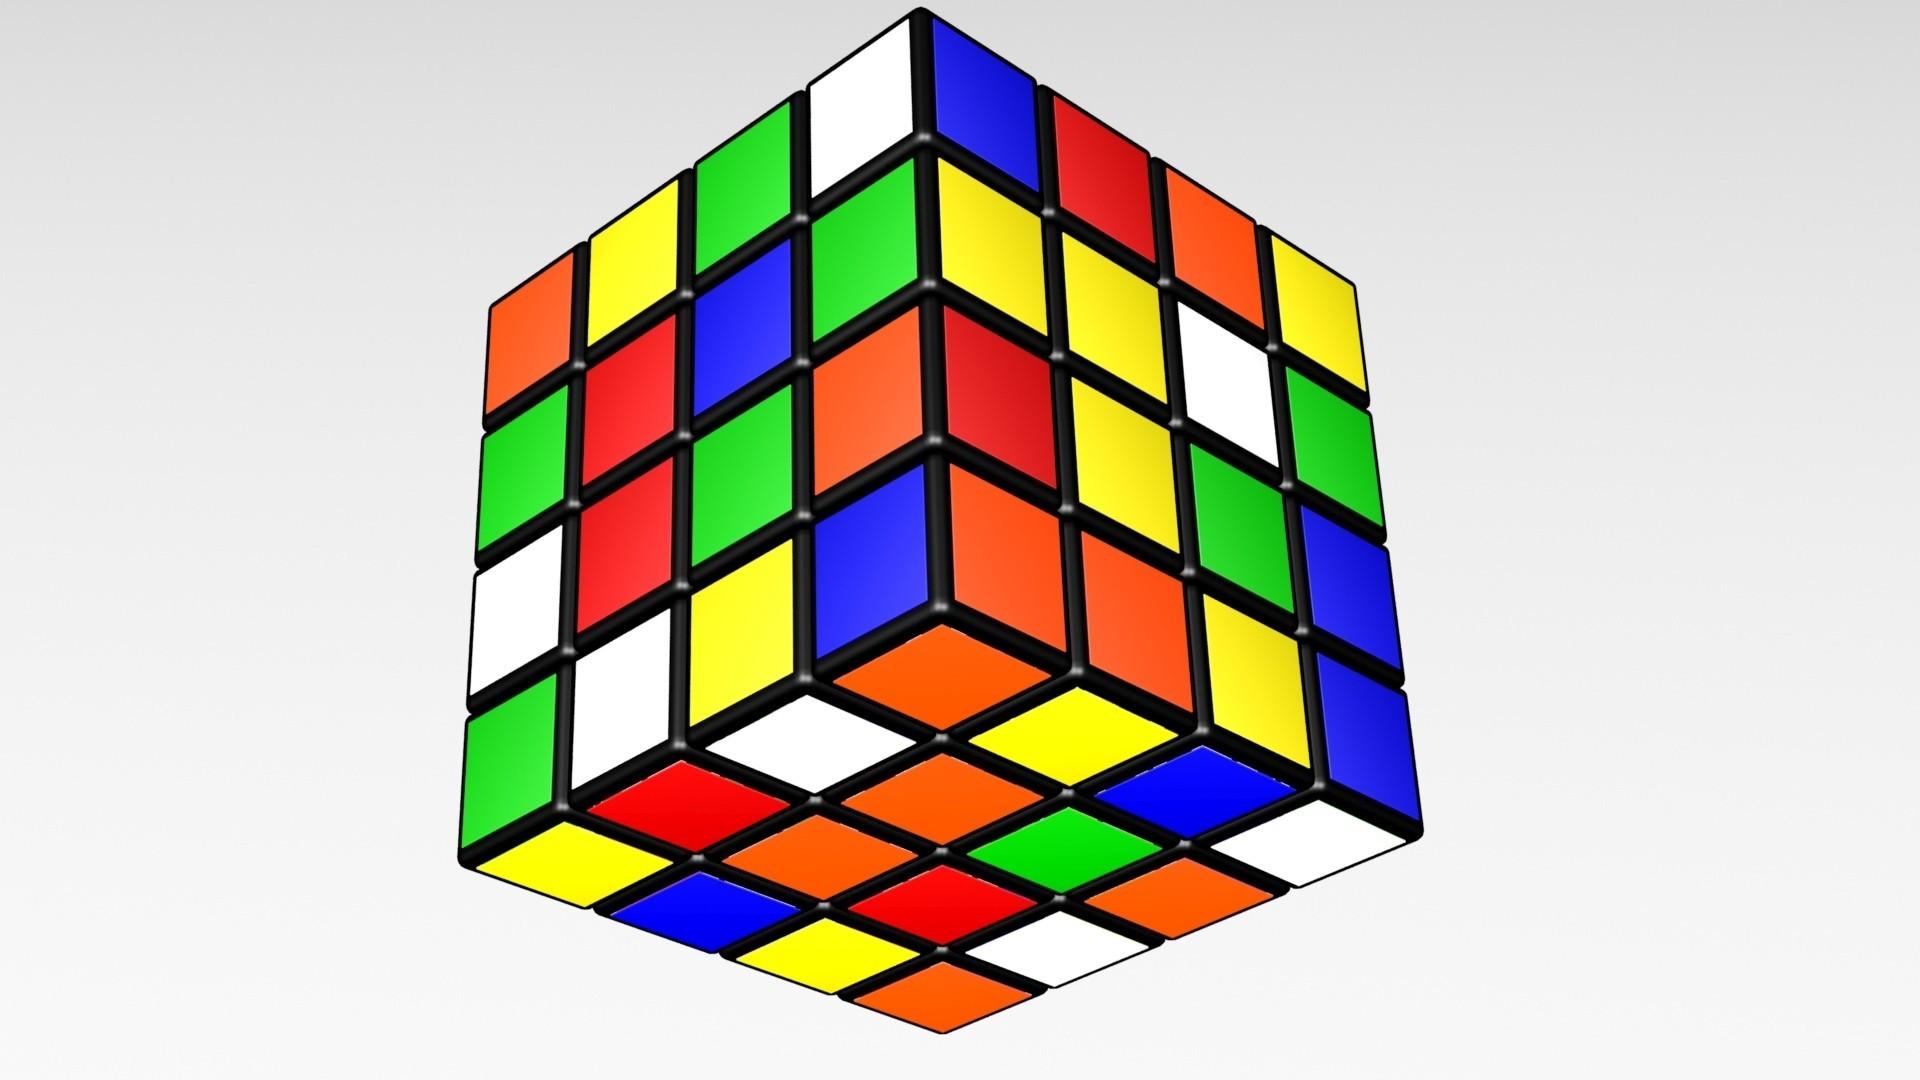 44444k.jpg Download STL file 4X4 SCRAMBLED RUBIK'S CUBE • 3D printer template, Knight1341